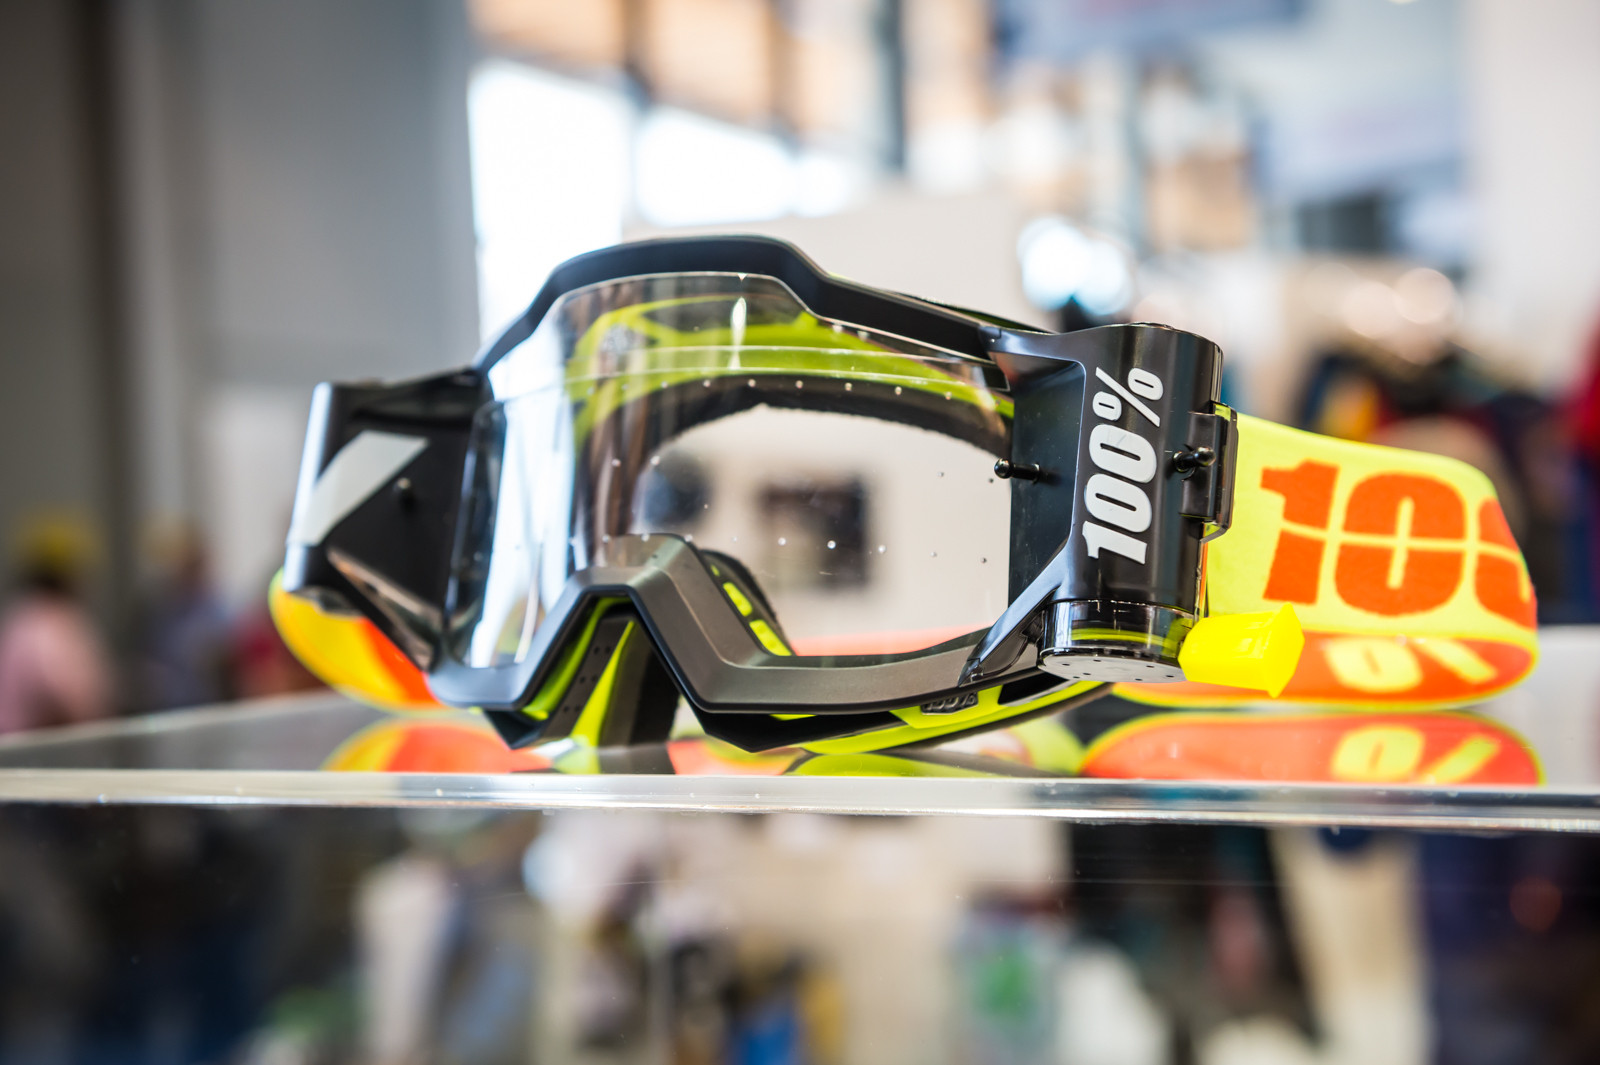 2016 100% Eyewear and Gloves - 2016 Mountain Bike Apparel & Protection at Eurobike - Mountain Biking Pictures - Vital MTB